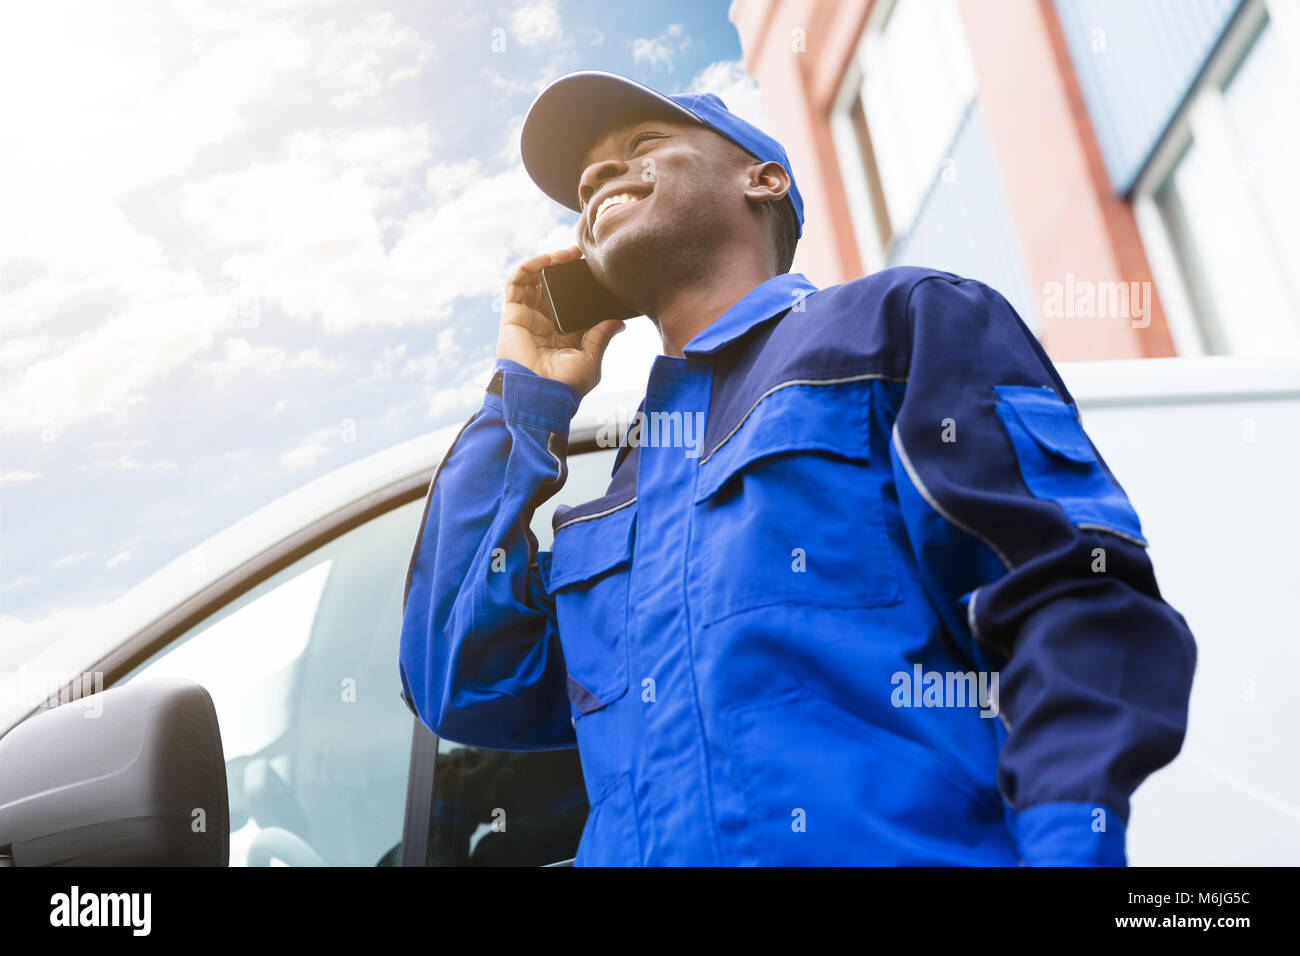 Low Angle View of Young Man Standing livraison près de Van Talking On Cellphone Photo Stock